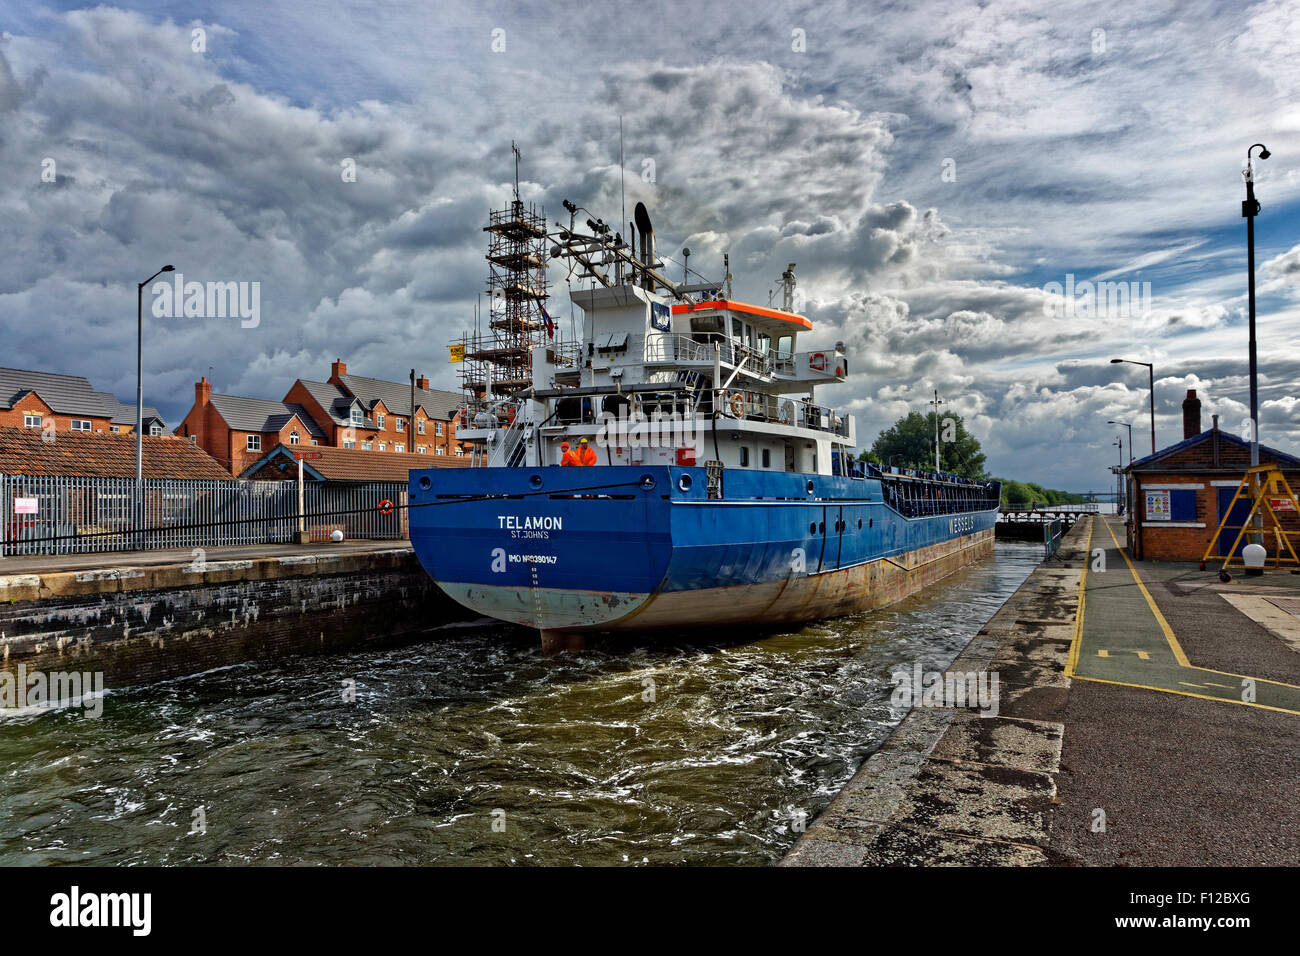 Coastal freighter 'Telamon' passing through Latchford Locks on the Manchester Ship Canal at Warrington, England. Stock Photo